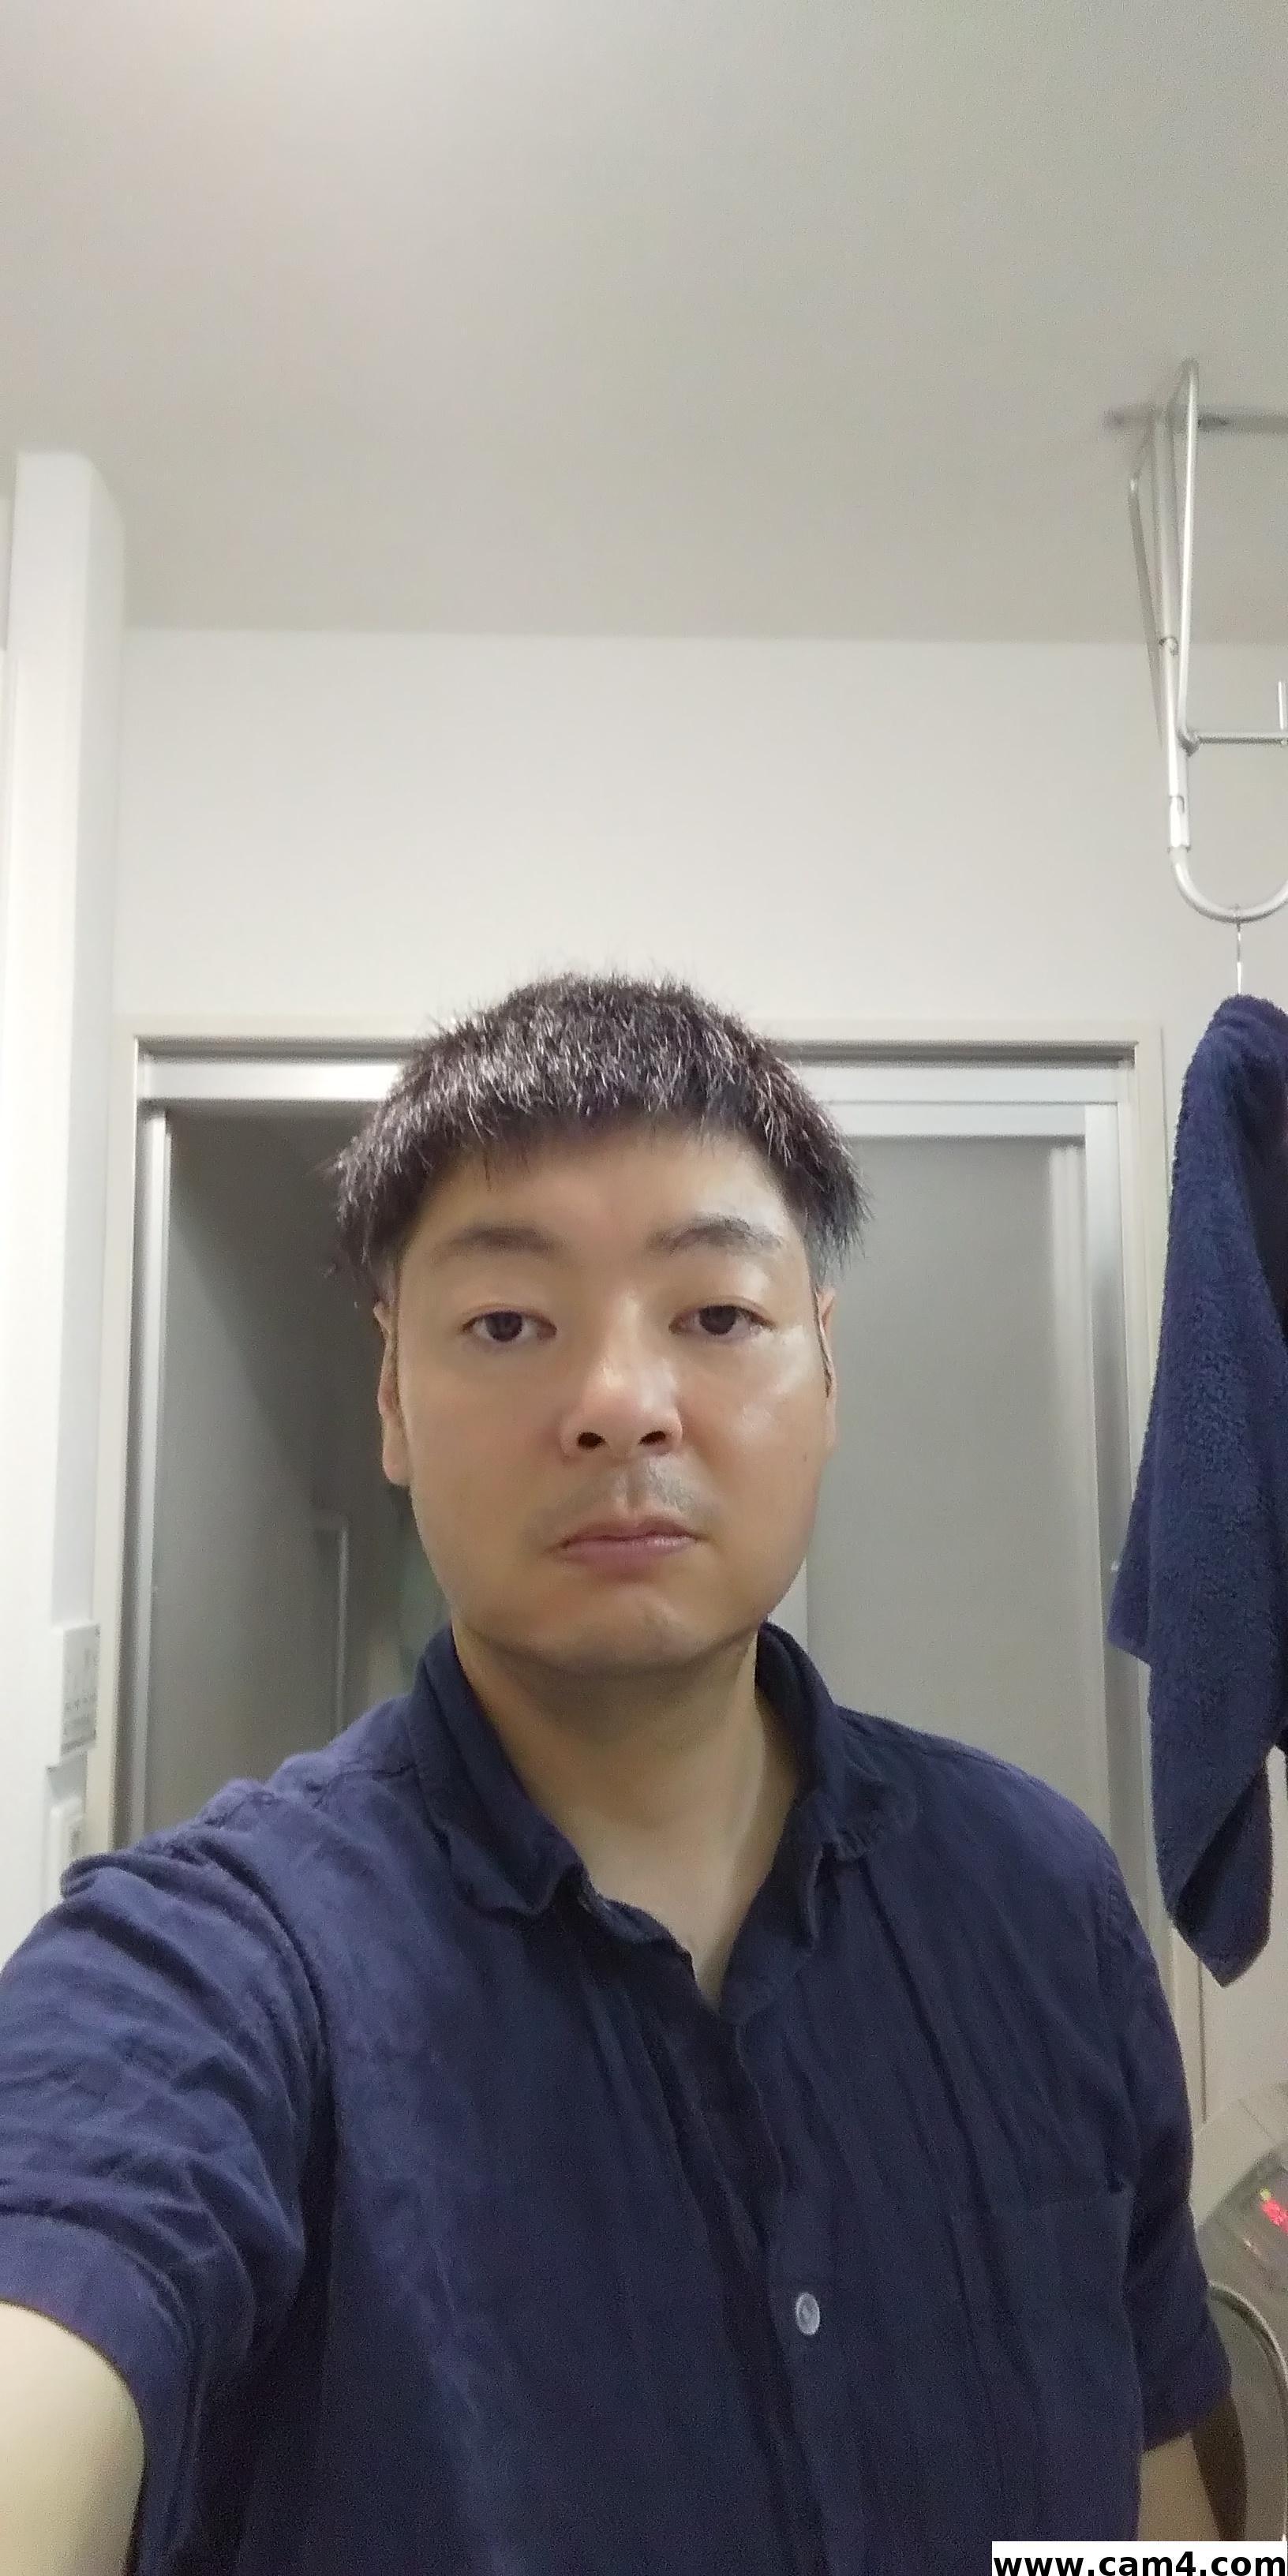 Daisuke?s=zjianbupl2x2gqquh91had2h8re2i0ffr3xz1zhw4wi=